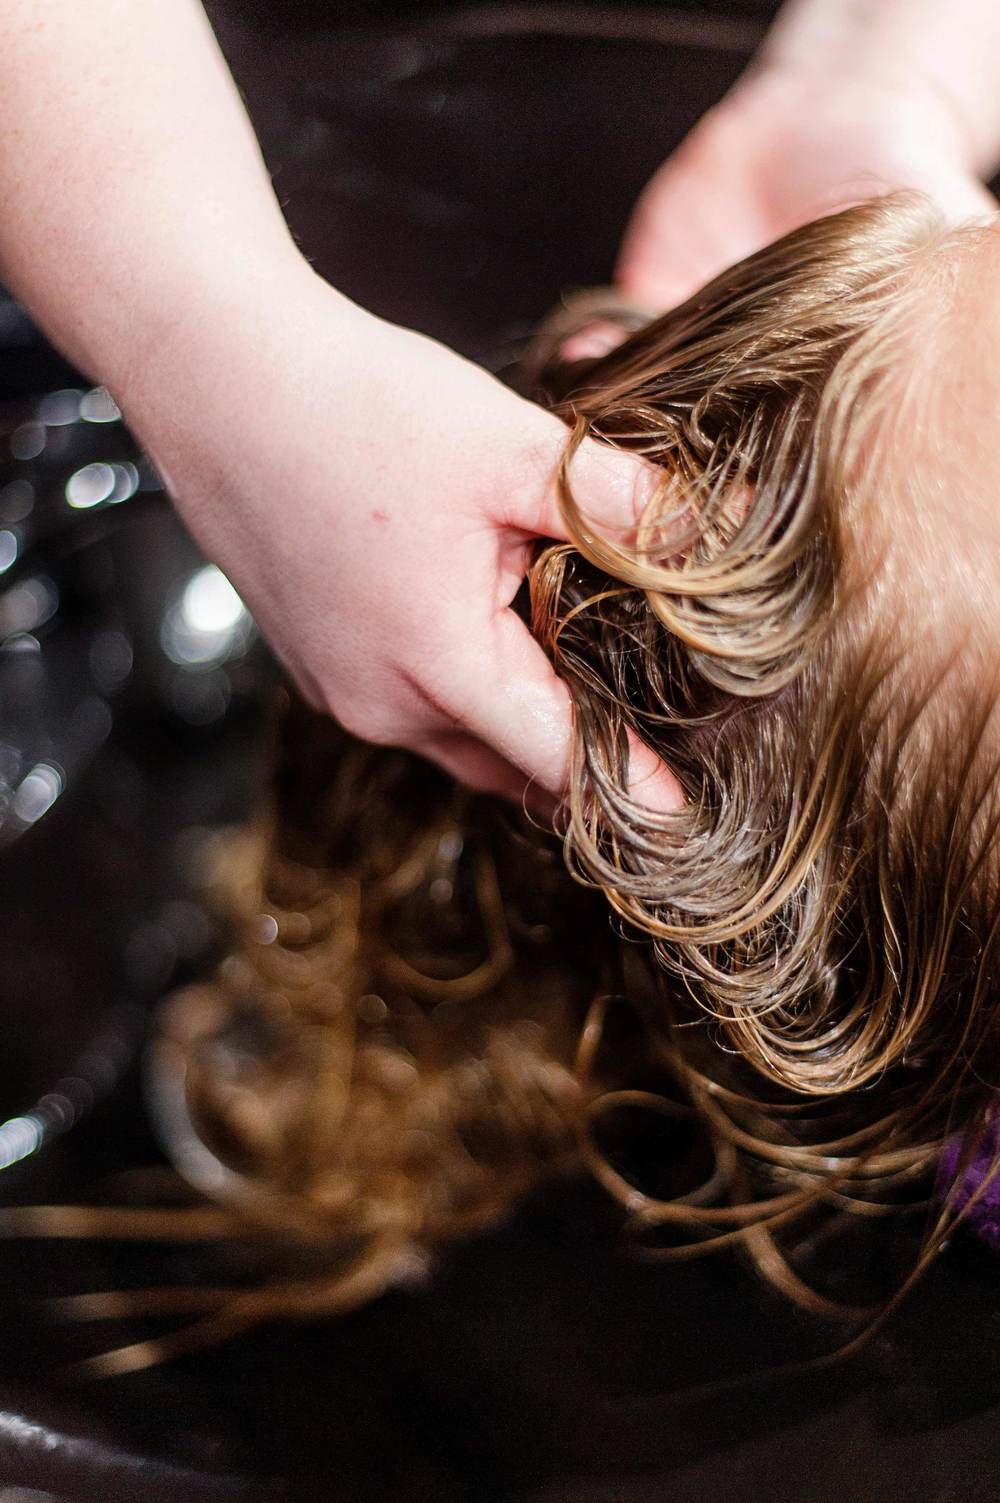 hair-washing-services-full-service-salon-fredericksburg-va.jpg